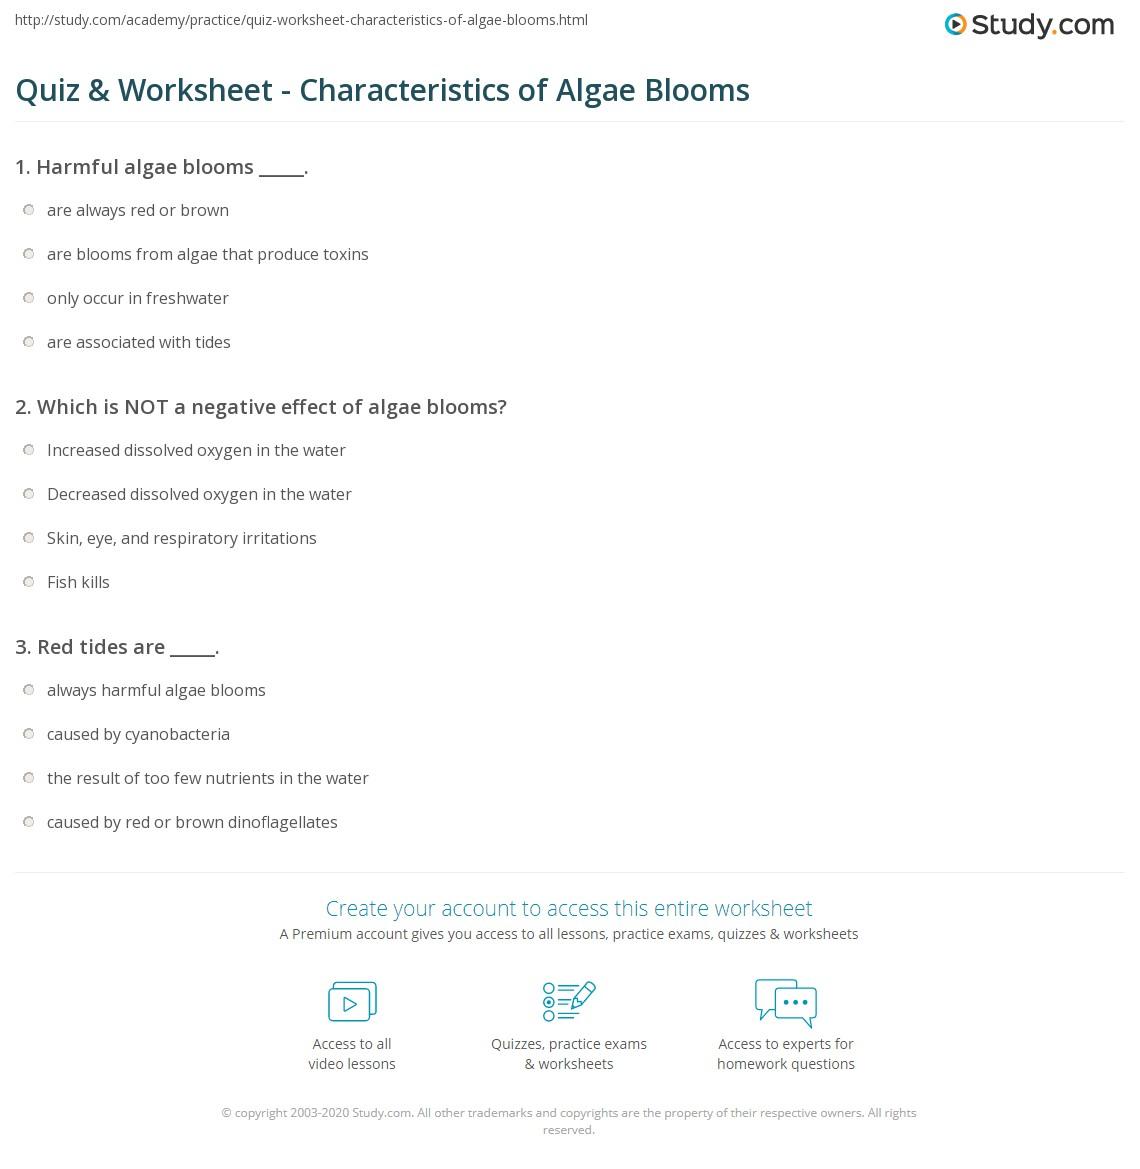 quiz worksheet characteristics of algae blooms. Black Bedroom Furniture Sets. Home Design Ideas